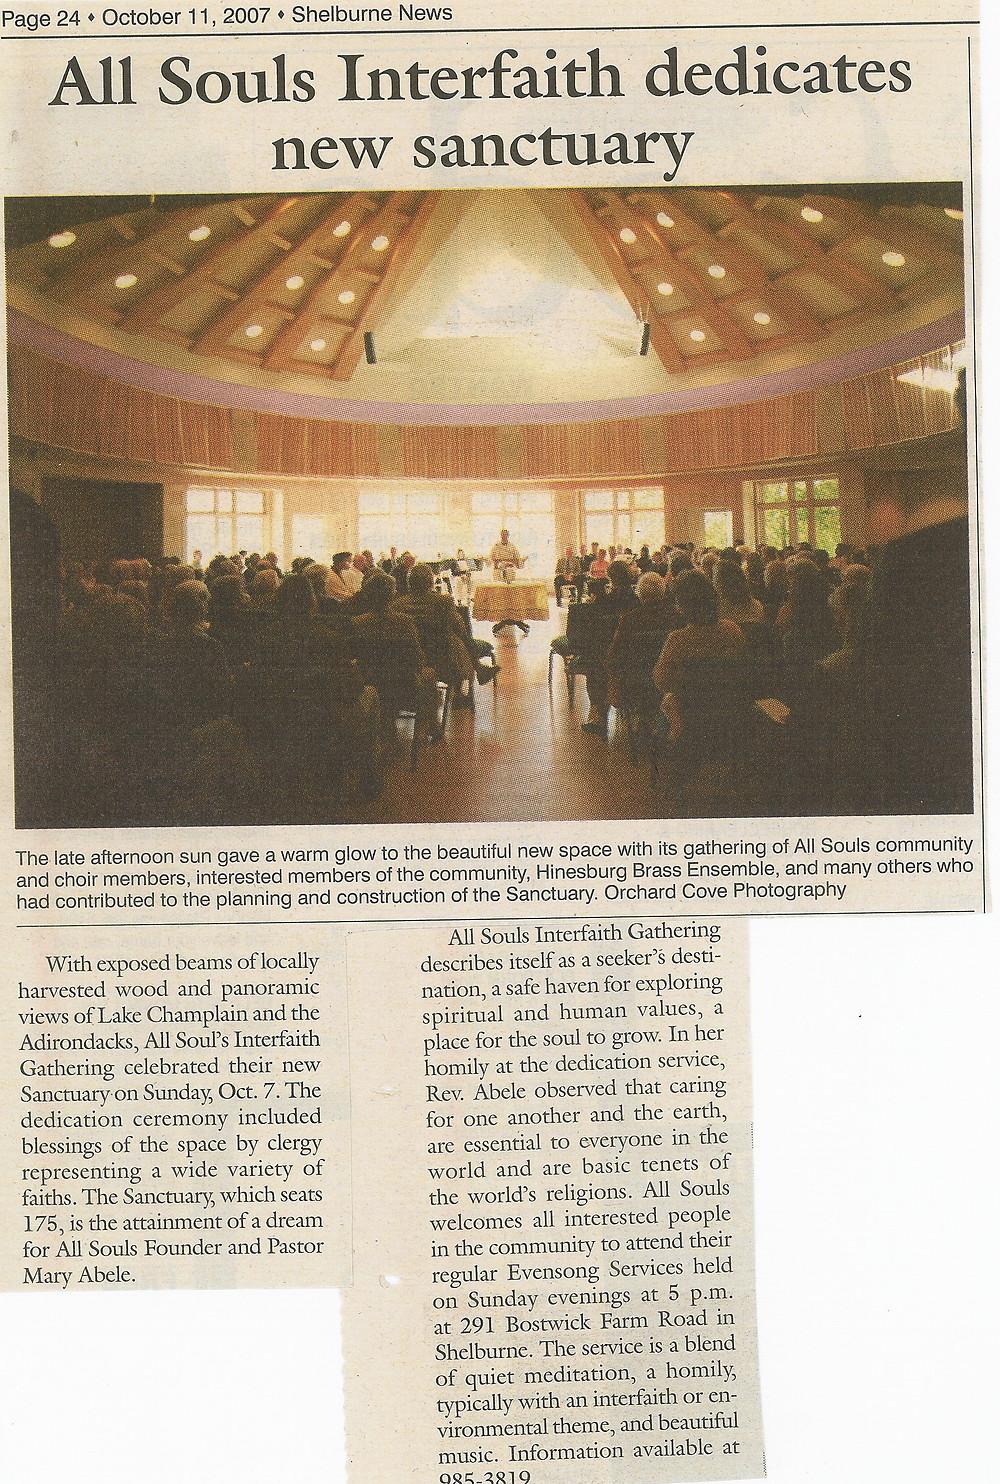 2007.10.11 All Souls Interfaith Dedicates New Sanctuary - Shelburne News.jpg